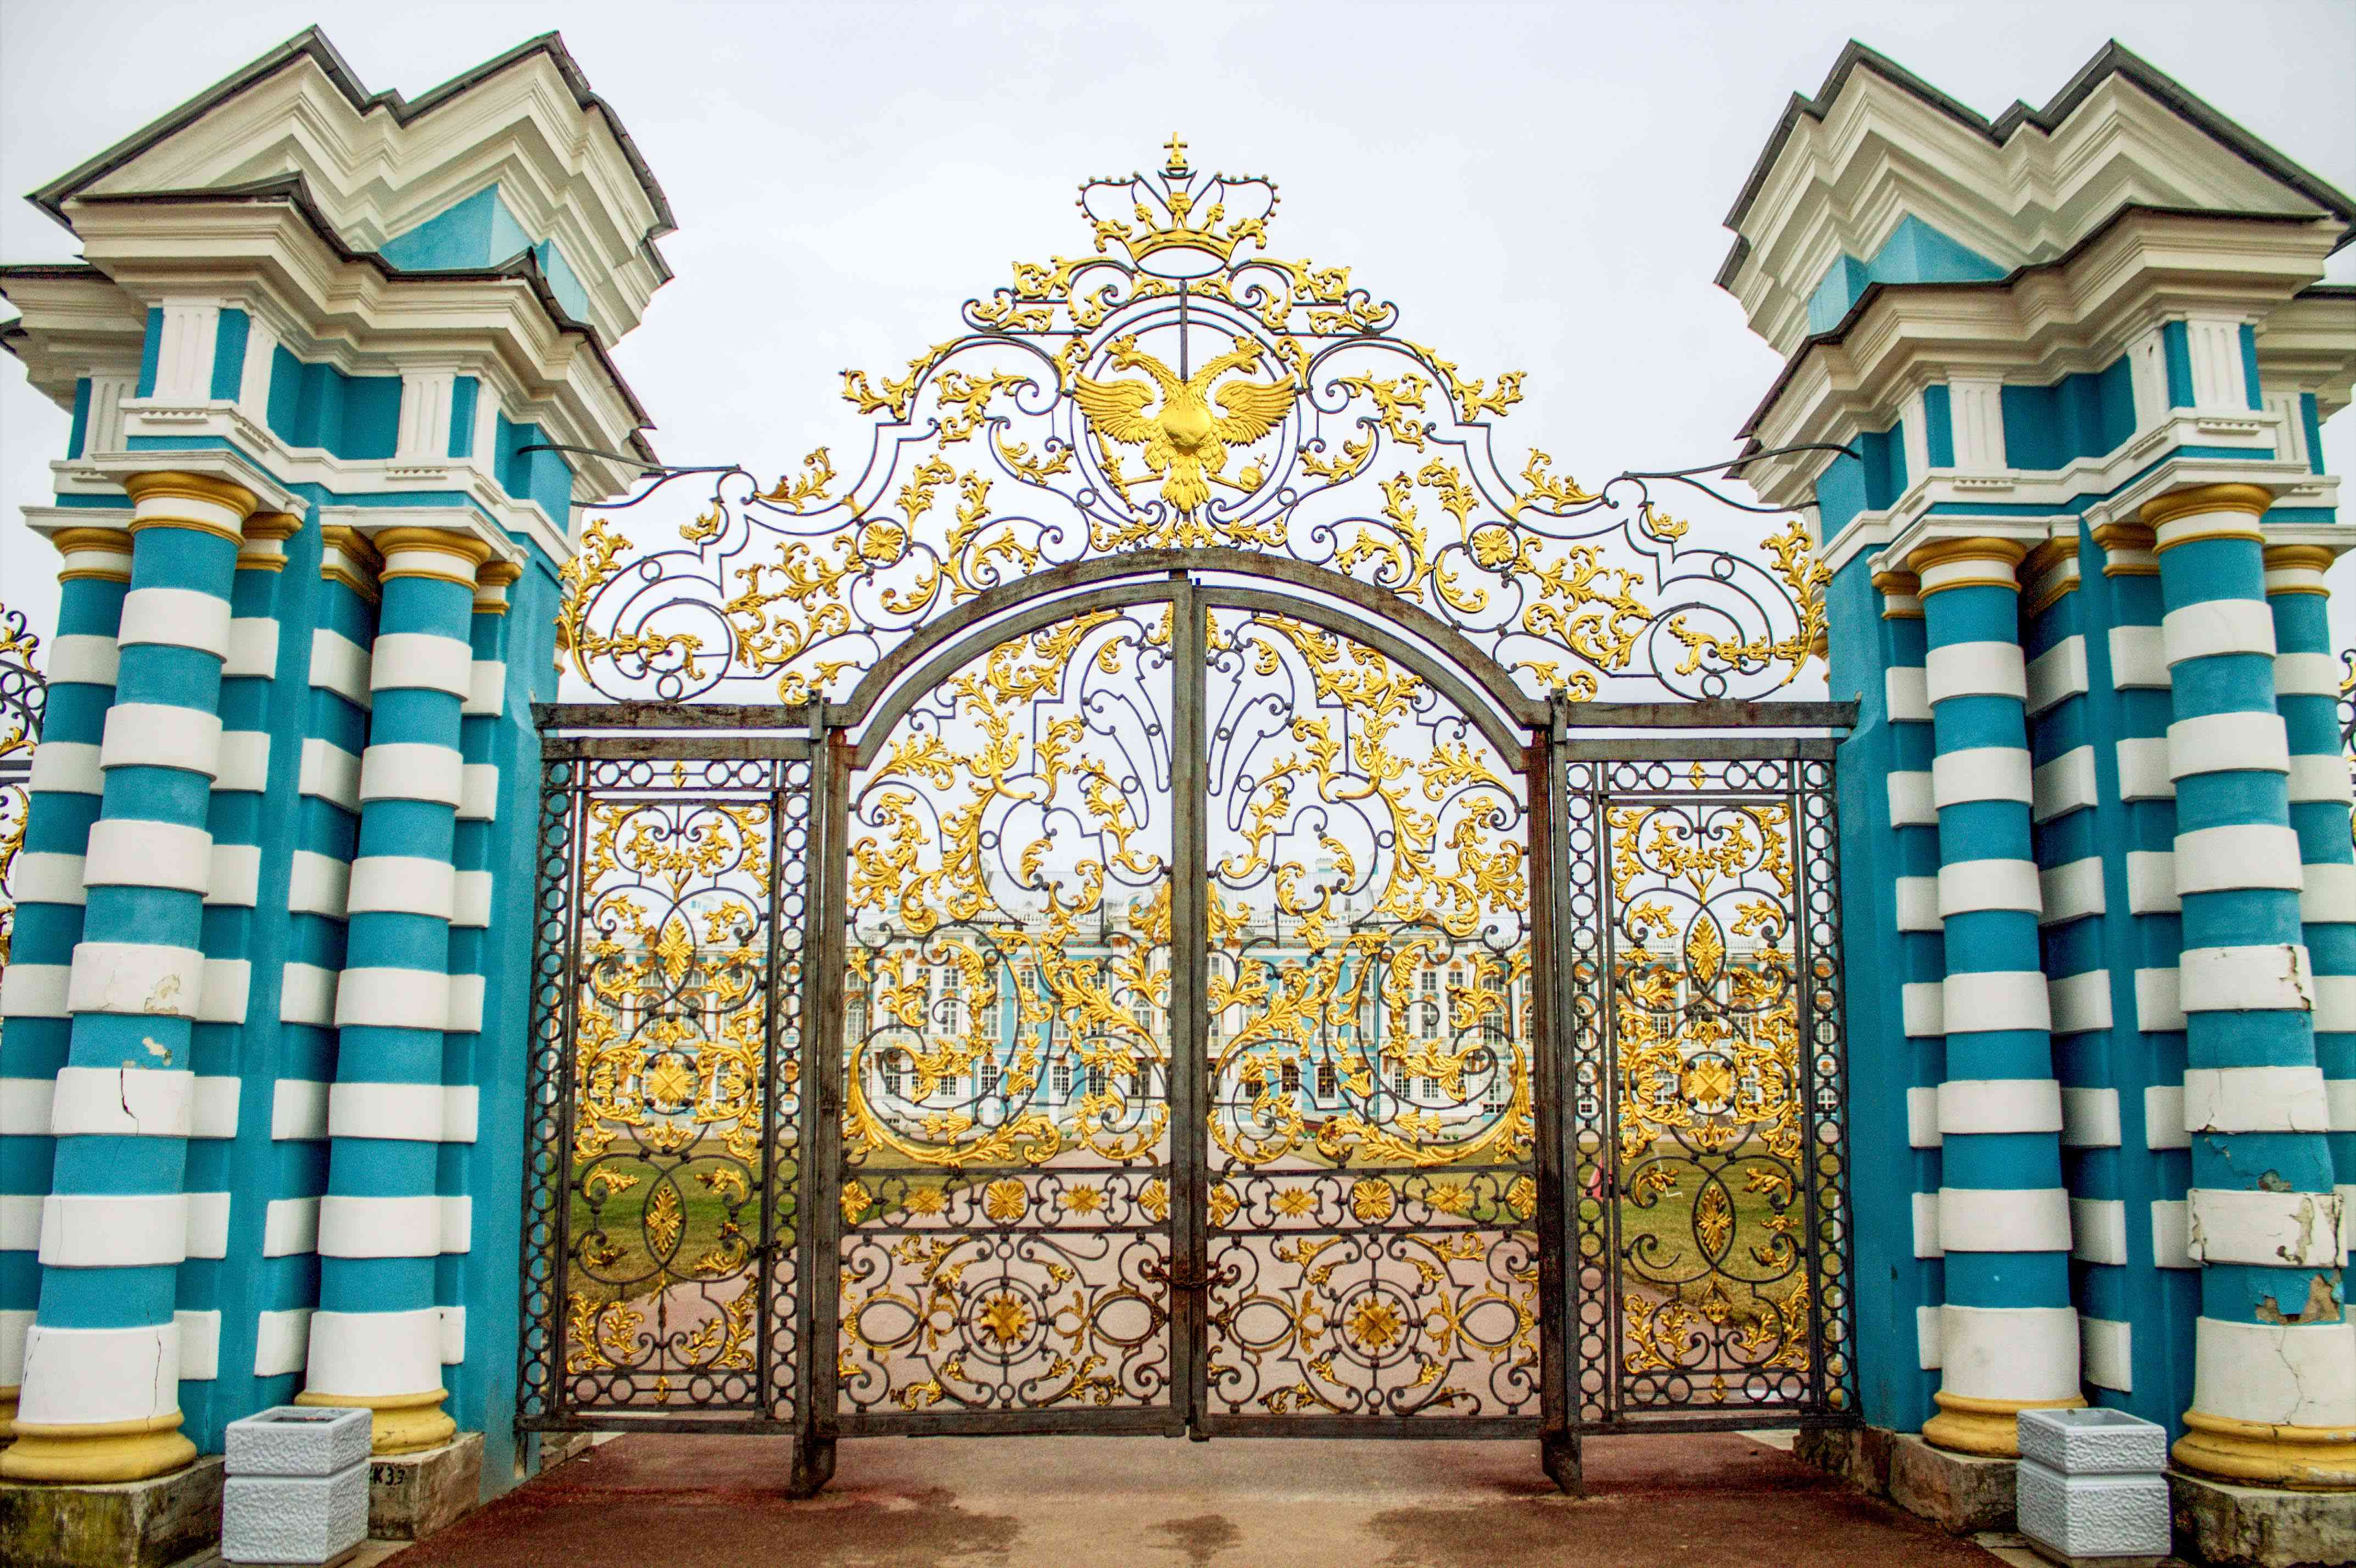 The ornate gates to Catherine Palace